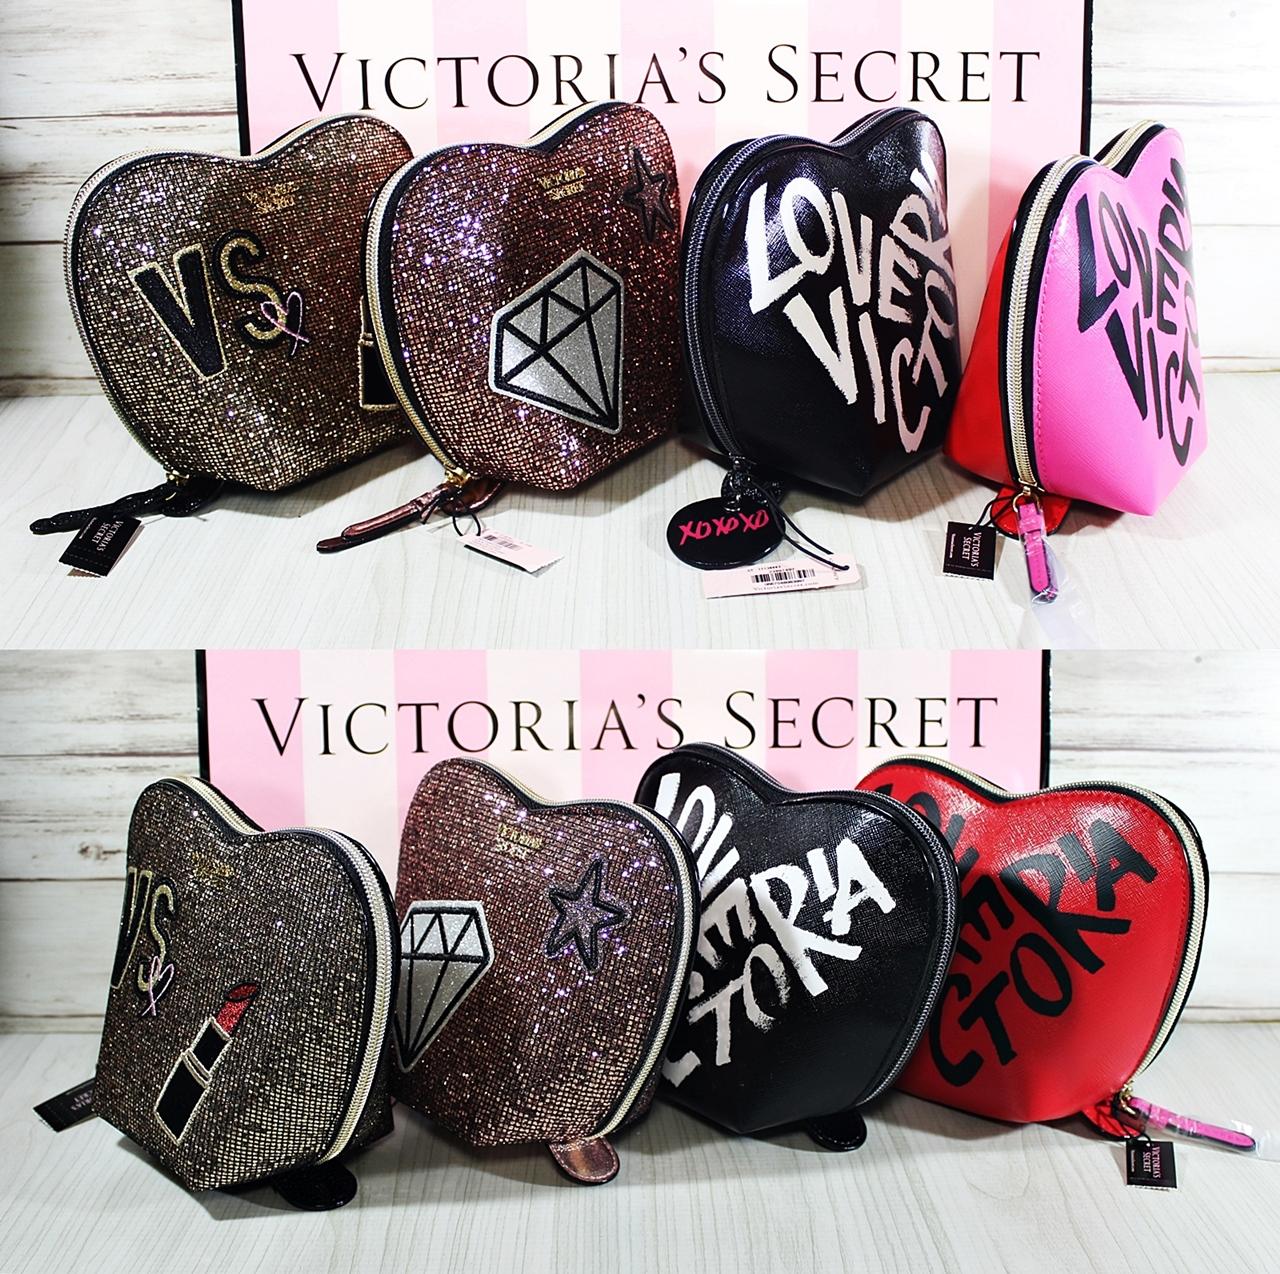 Victoria's Secret Heart Cosmetic Travel Makeup Case